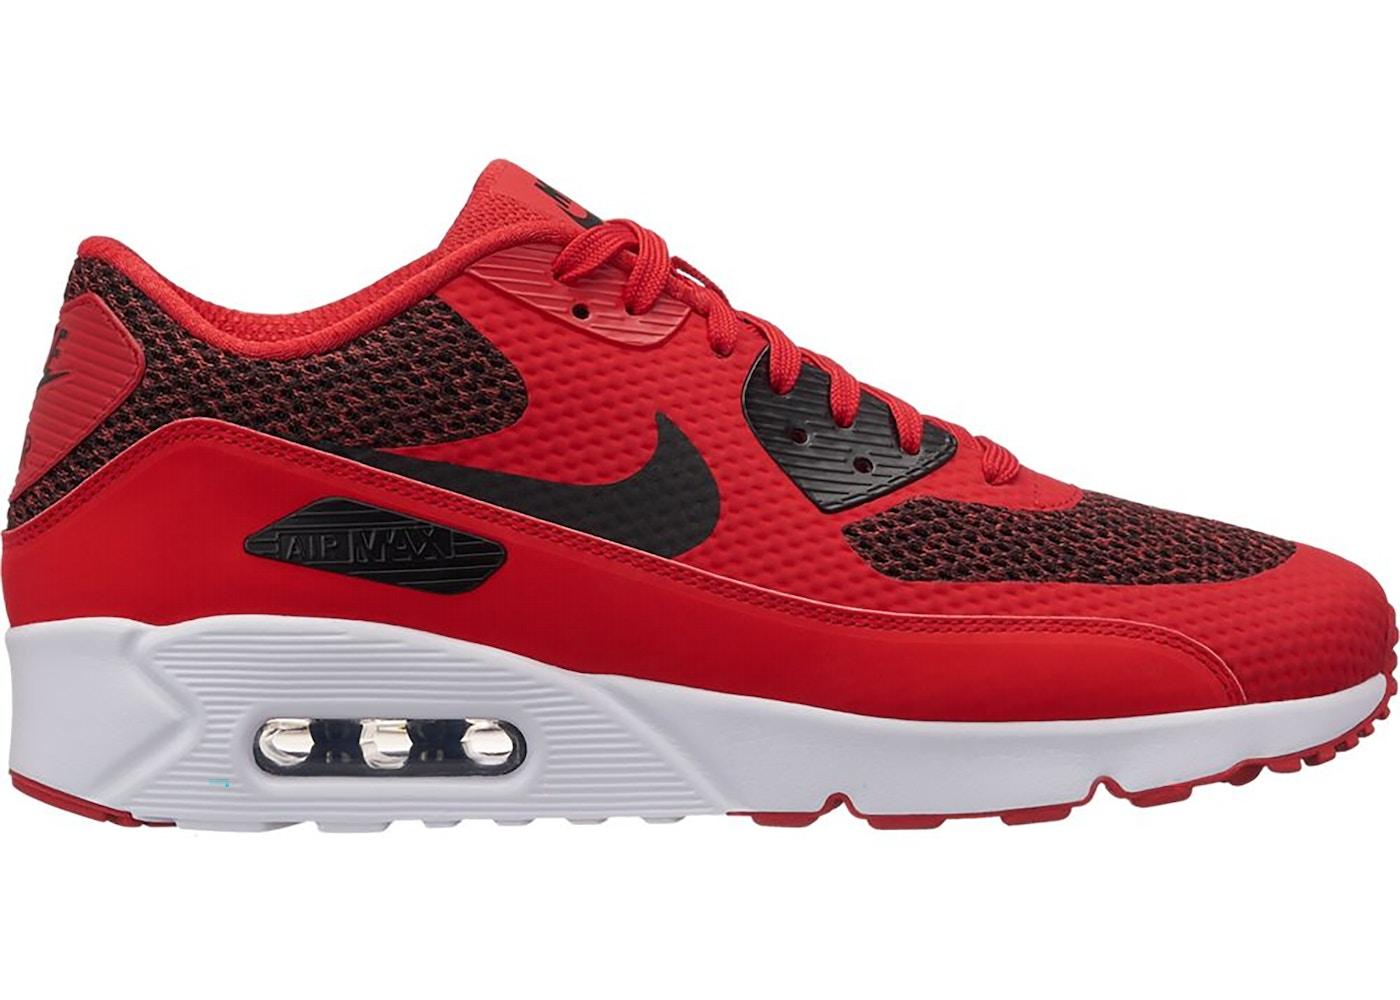 Nike Air Max 90 Ultra 2.0 University Red Black - 875695-604